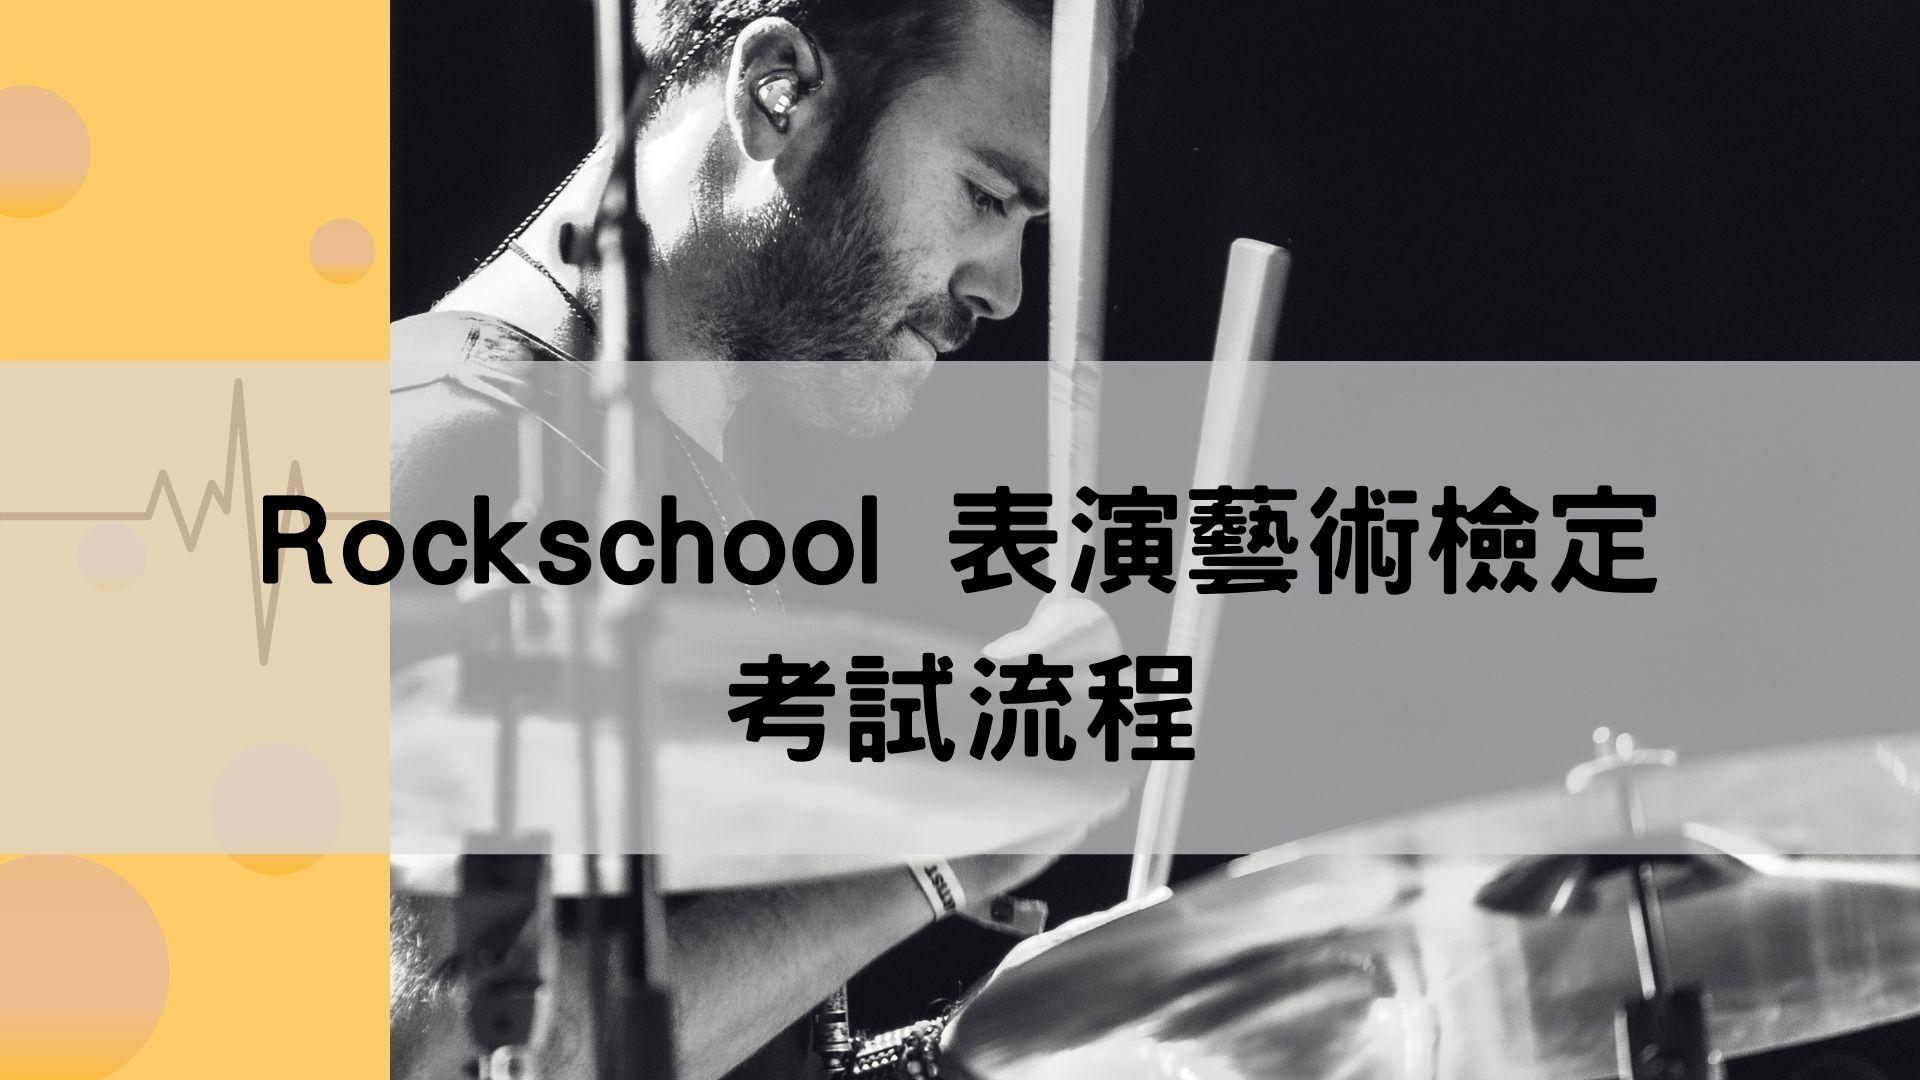 Rockschool 表演藝術檢定,考試流程!